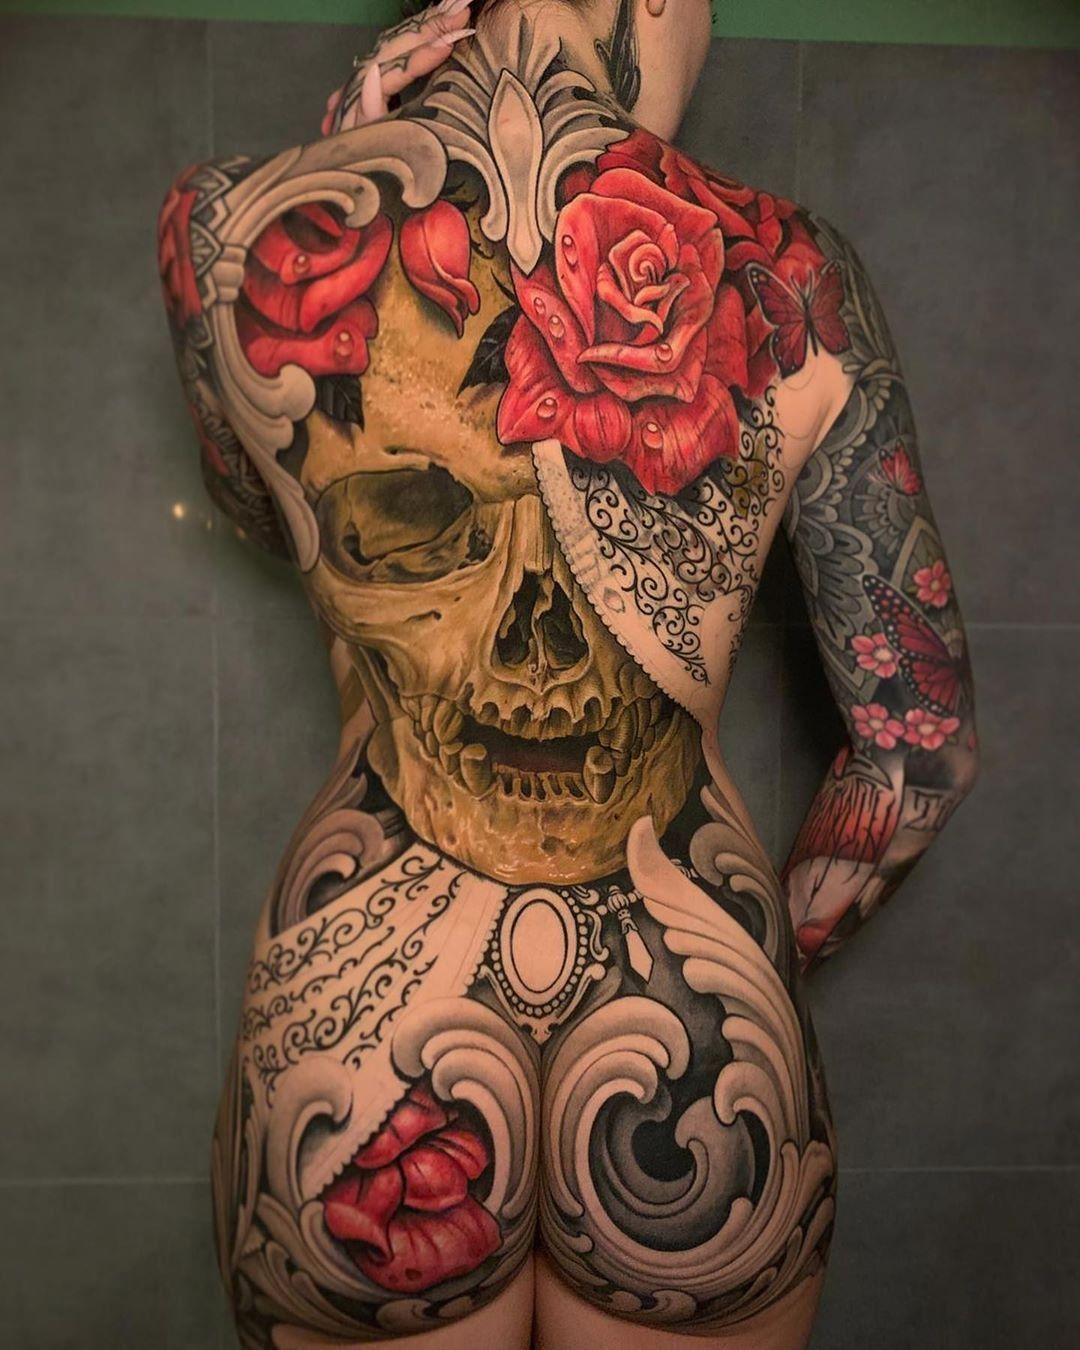 Pin by عرفان لاوی on erfan in 2020 Tattoo work, Tattoos